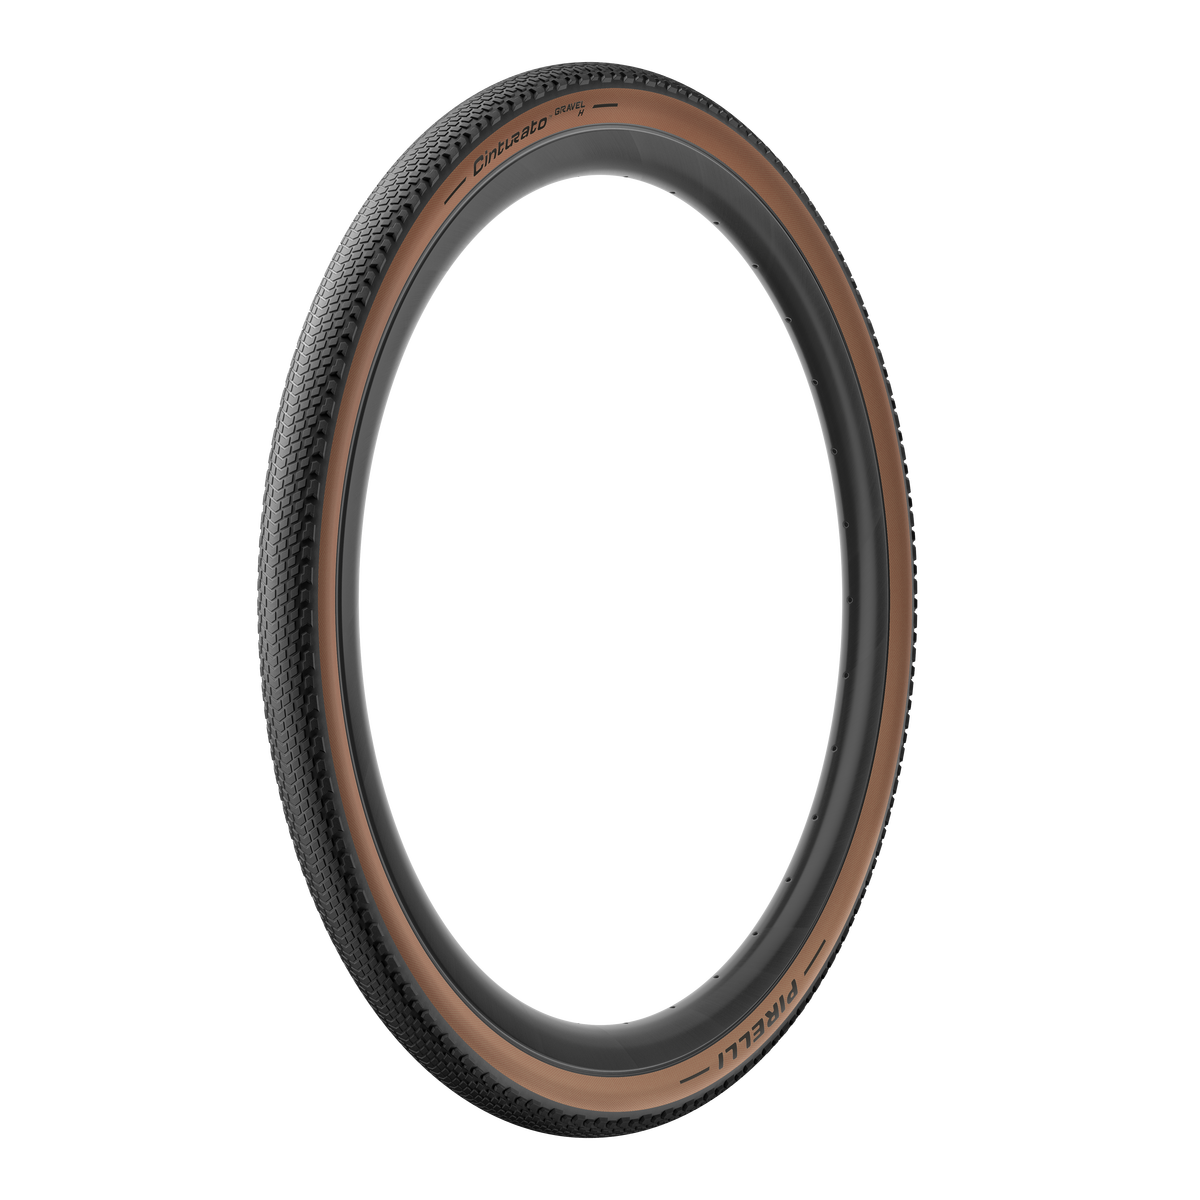 Plášť Pirelli Cinturato™ GRAVEL H Classic 35-622